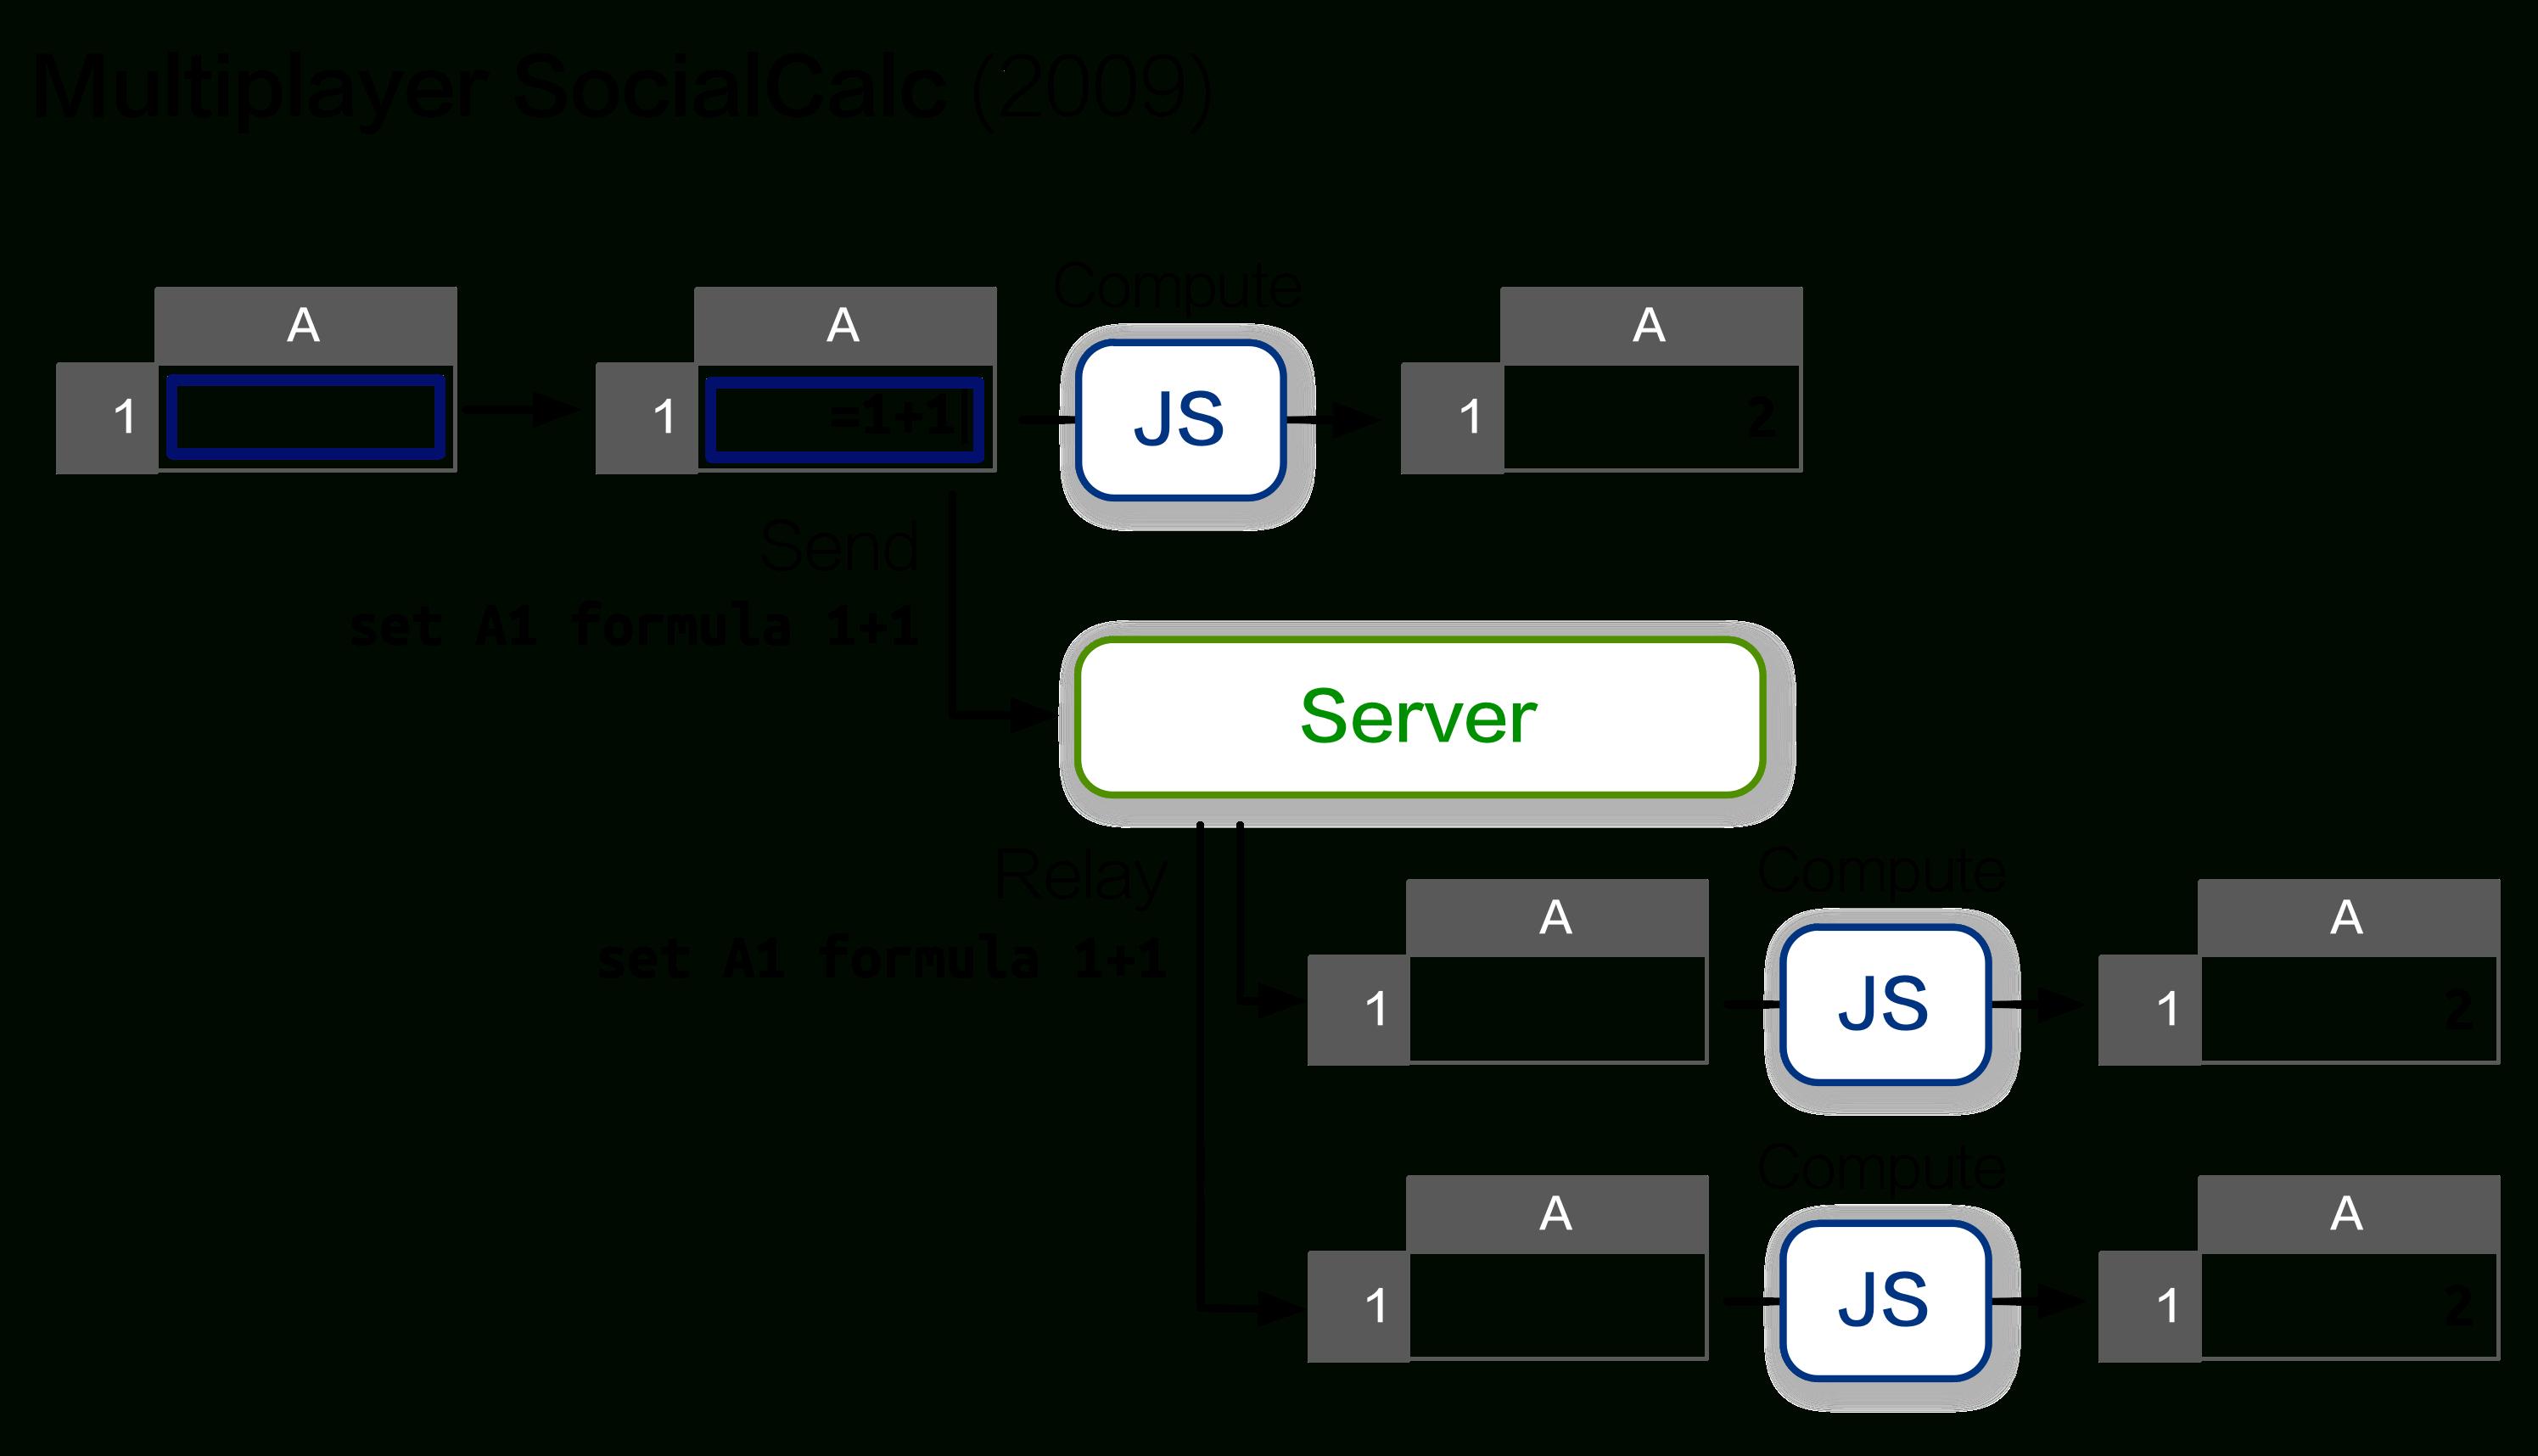 Javascript Spreadsheet Open Source Intended For Ethercalc Javascript Spreadsheet Open Source Payment Spreadshee Payment Spreadshee javascript spreadsheet open source